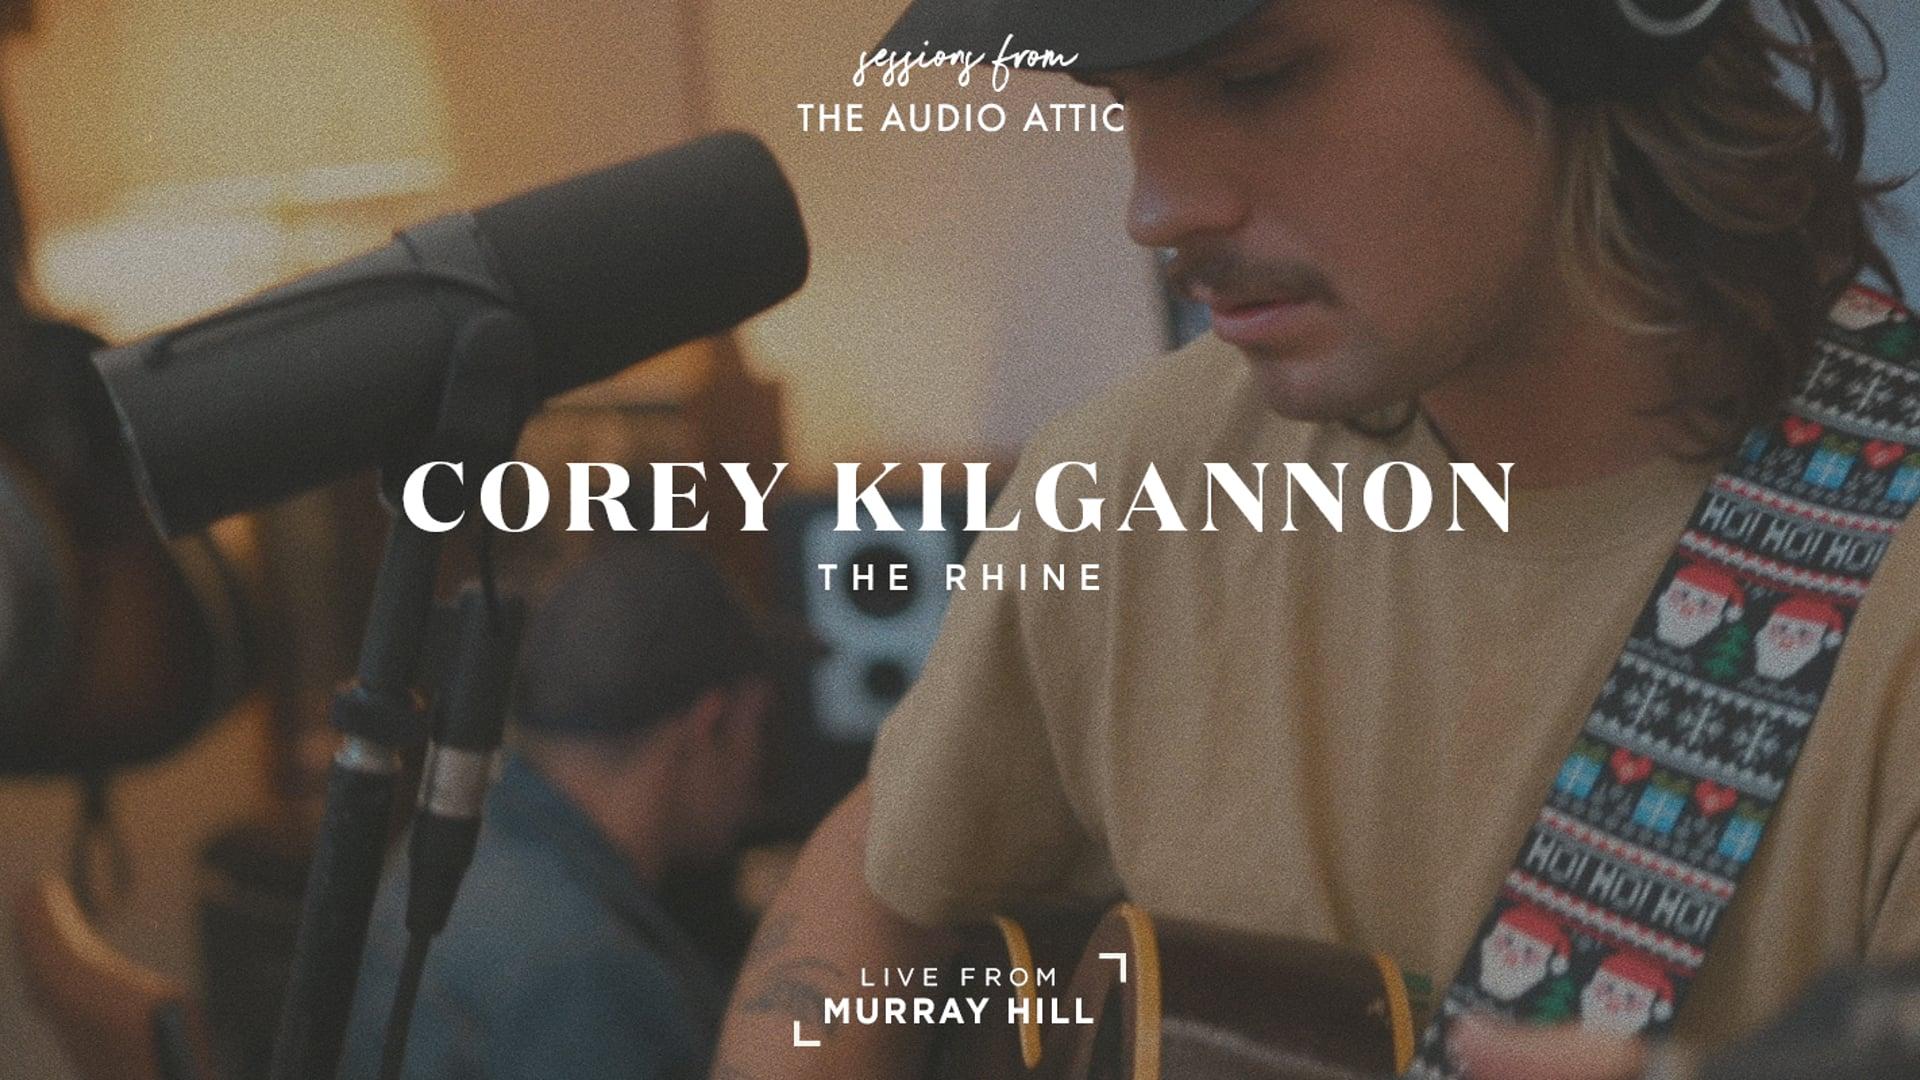 The Audio Attic Sessions - Corey Kilgannon - The Rhine